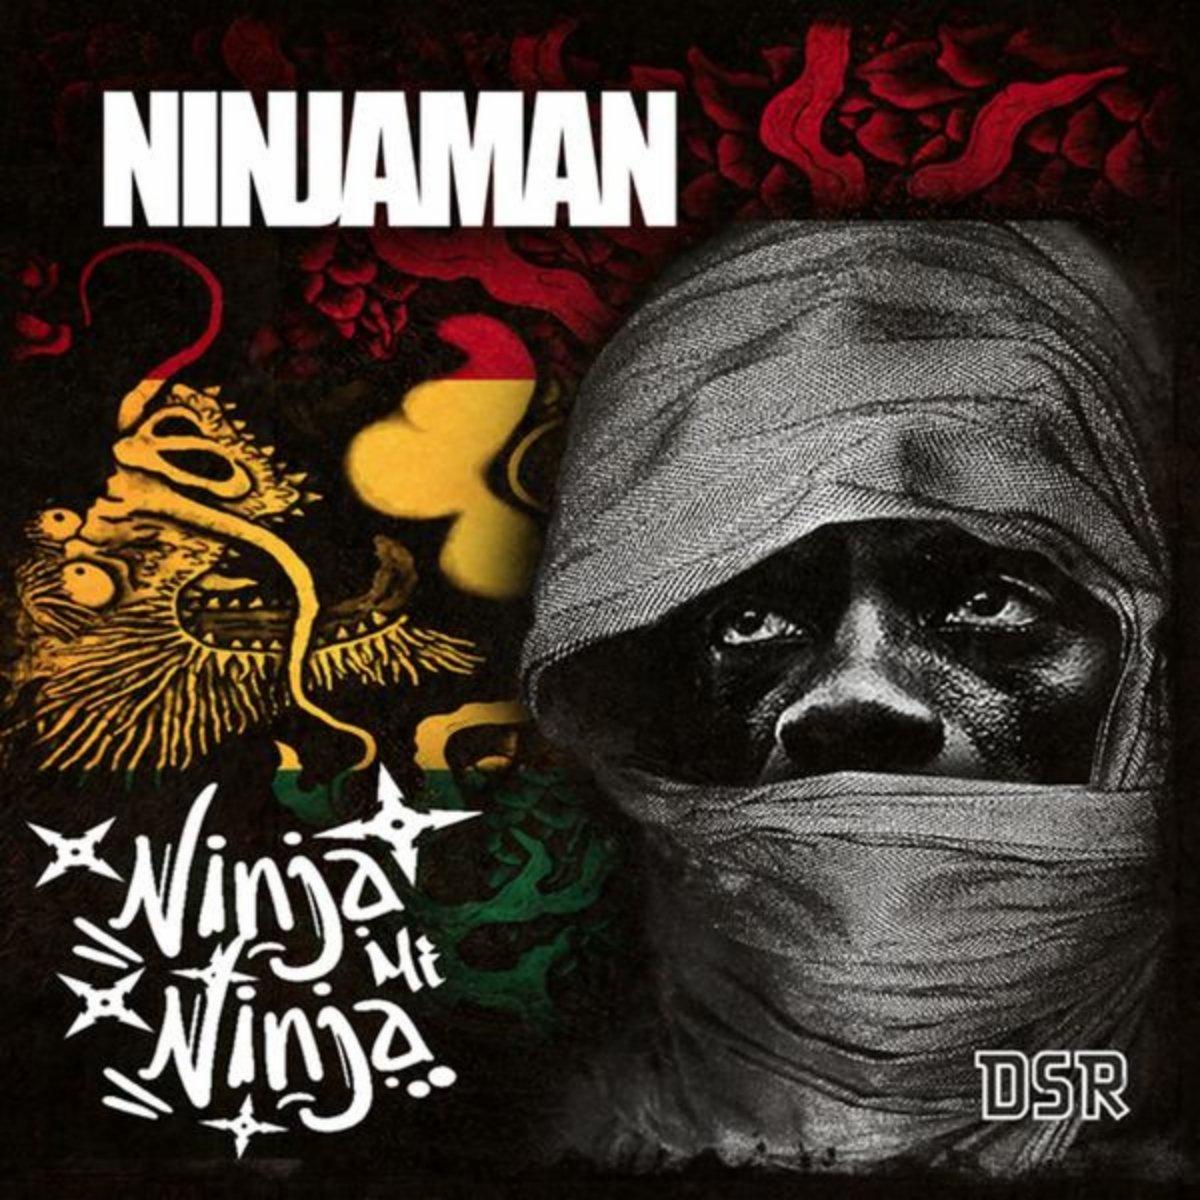 Ninjaman - Ninja Mi Ninja (2014) [FLAC] Download